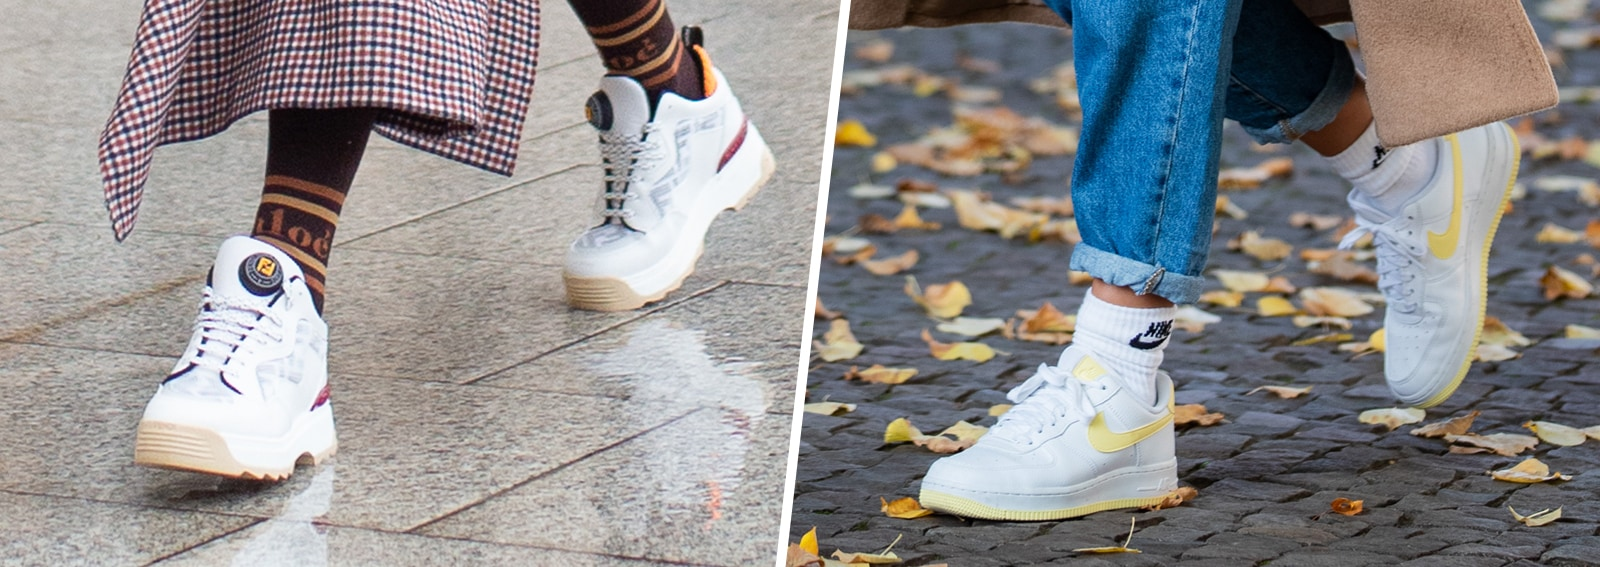 DESKTOP_sneakers